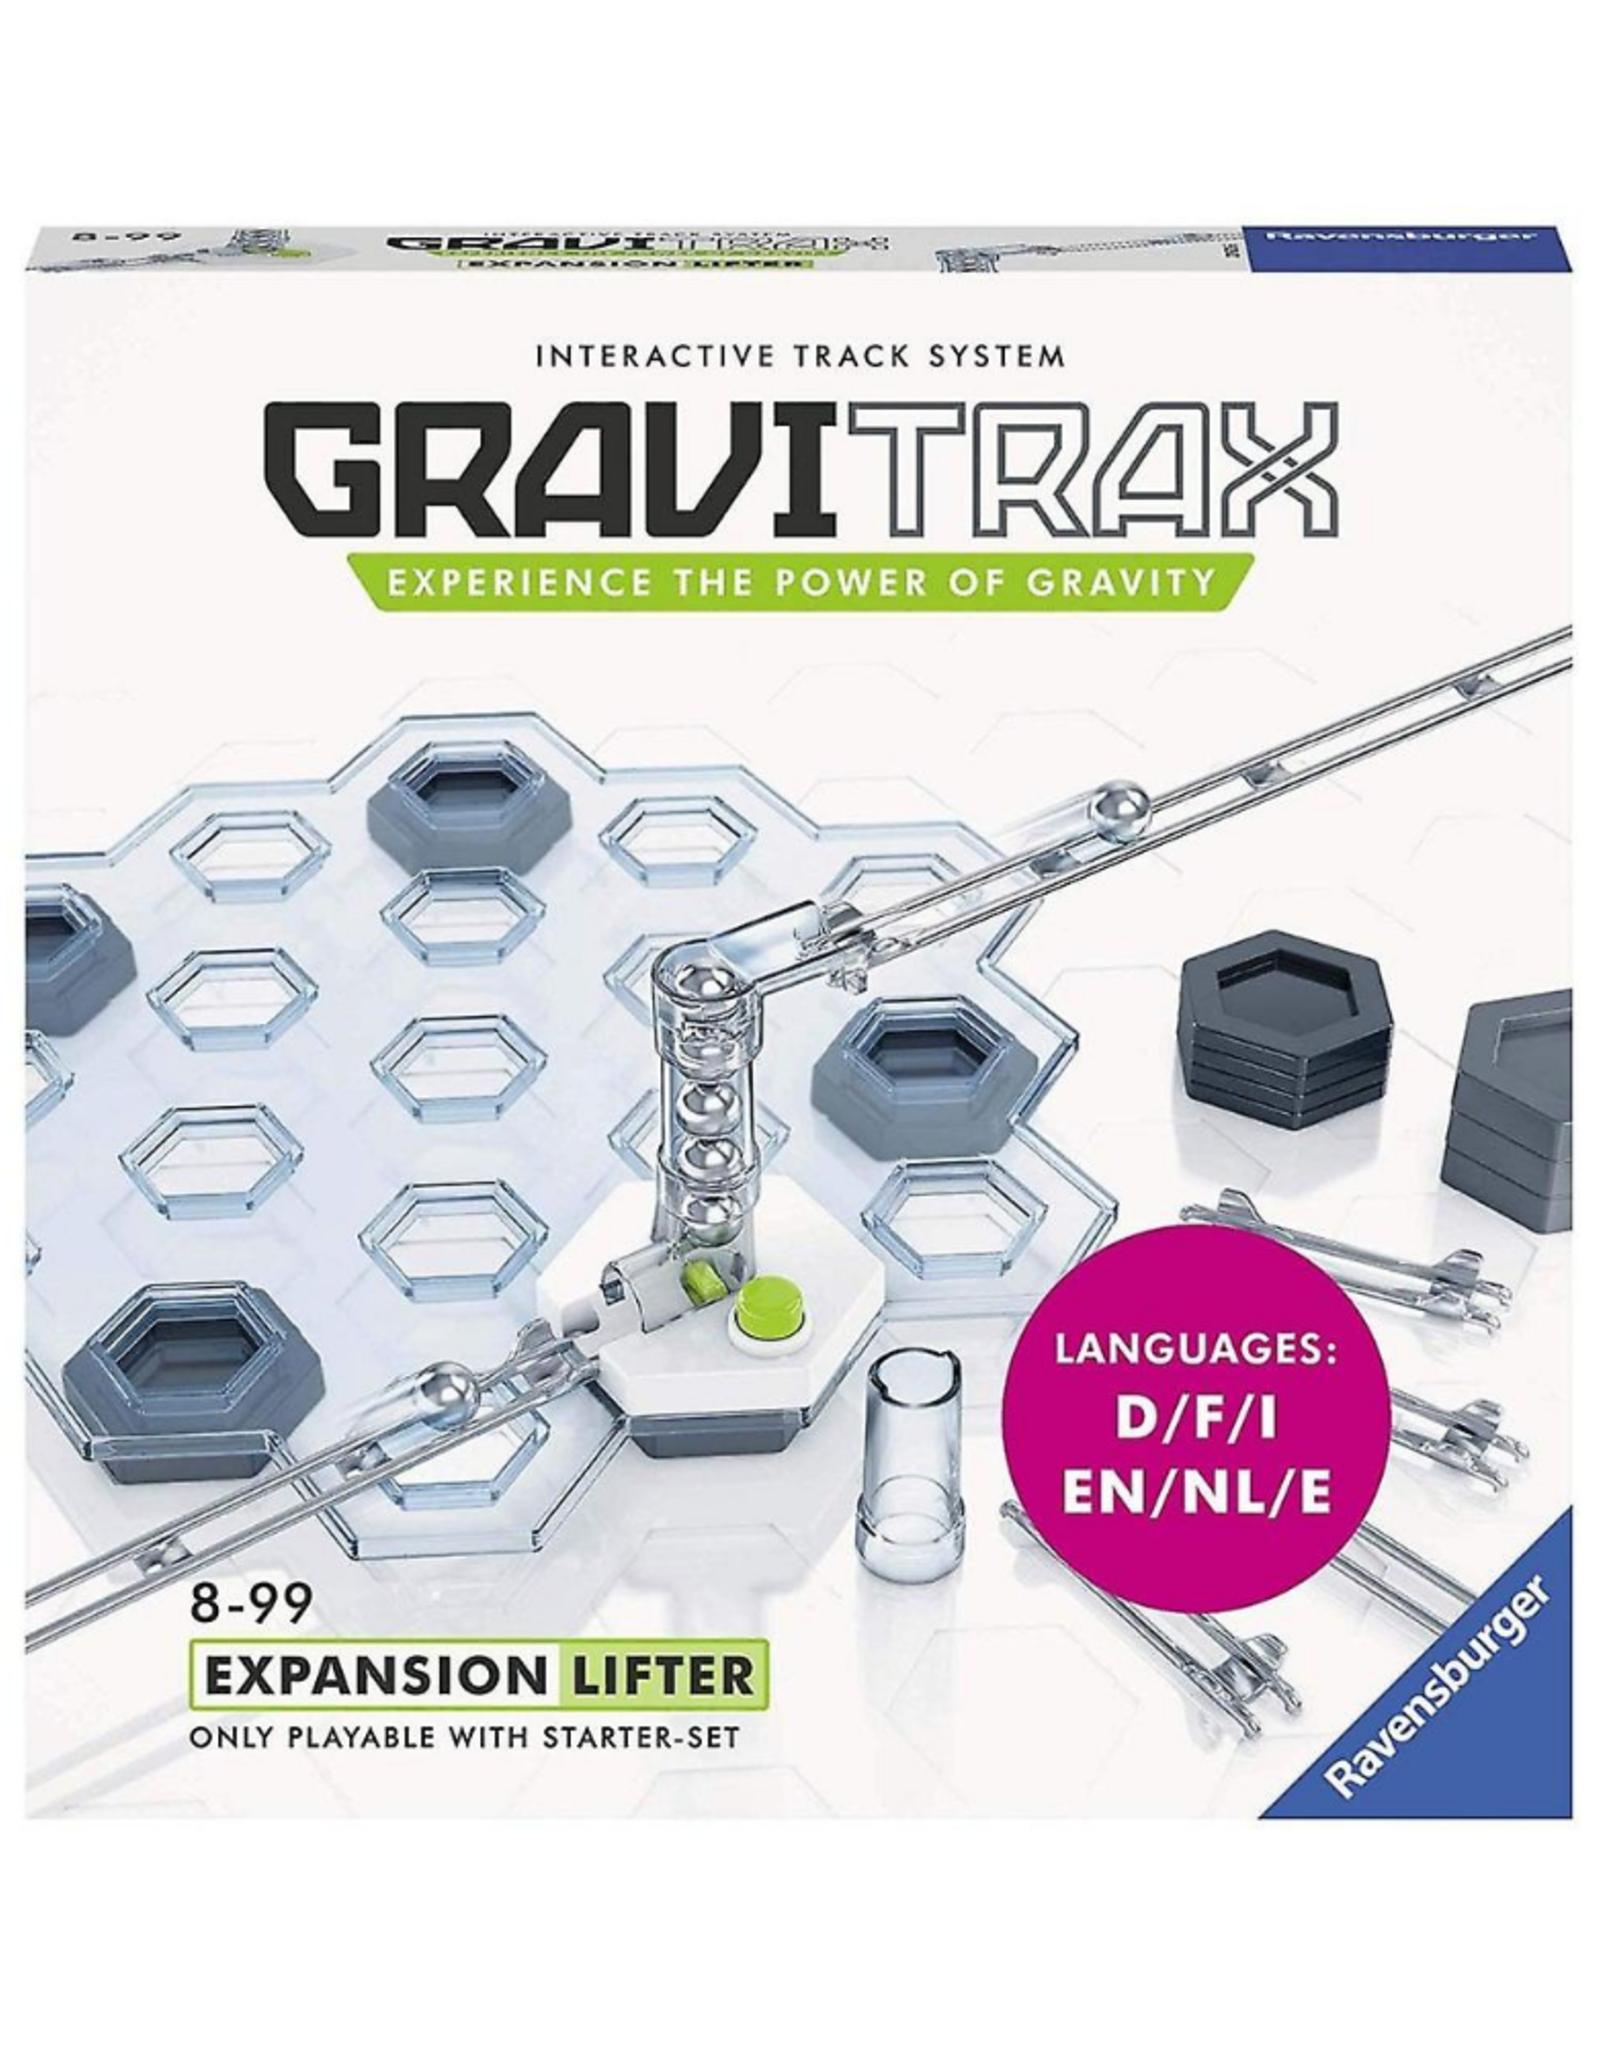 Gravitrax Accessory: Lifter